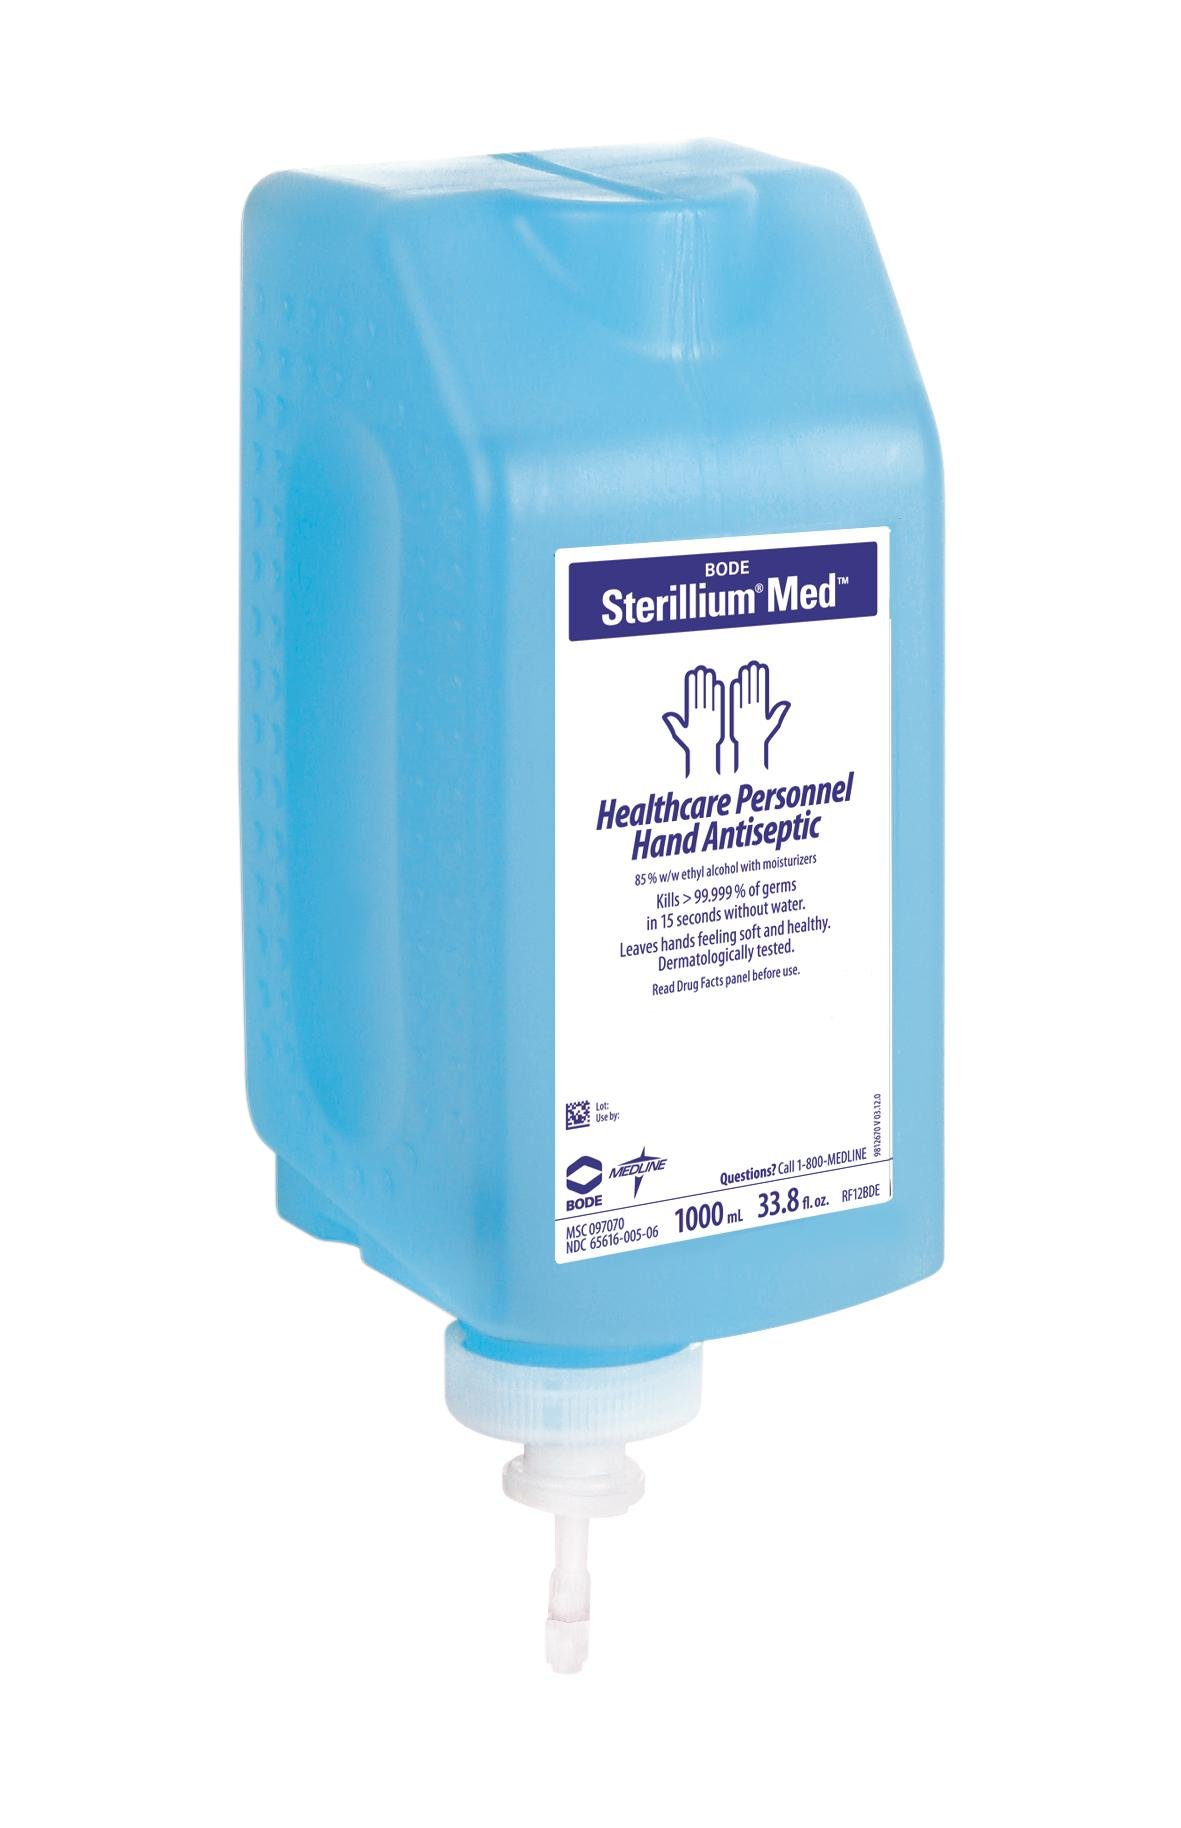 Medline MSC097070 Sterillium Med Liquid Hand Sanitizer, Clear (Case of 8)